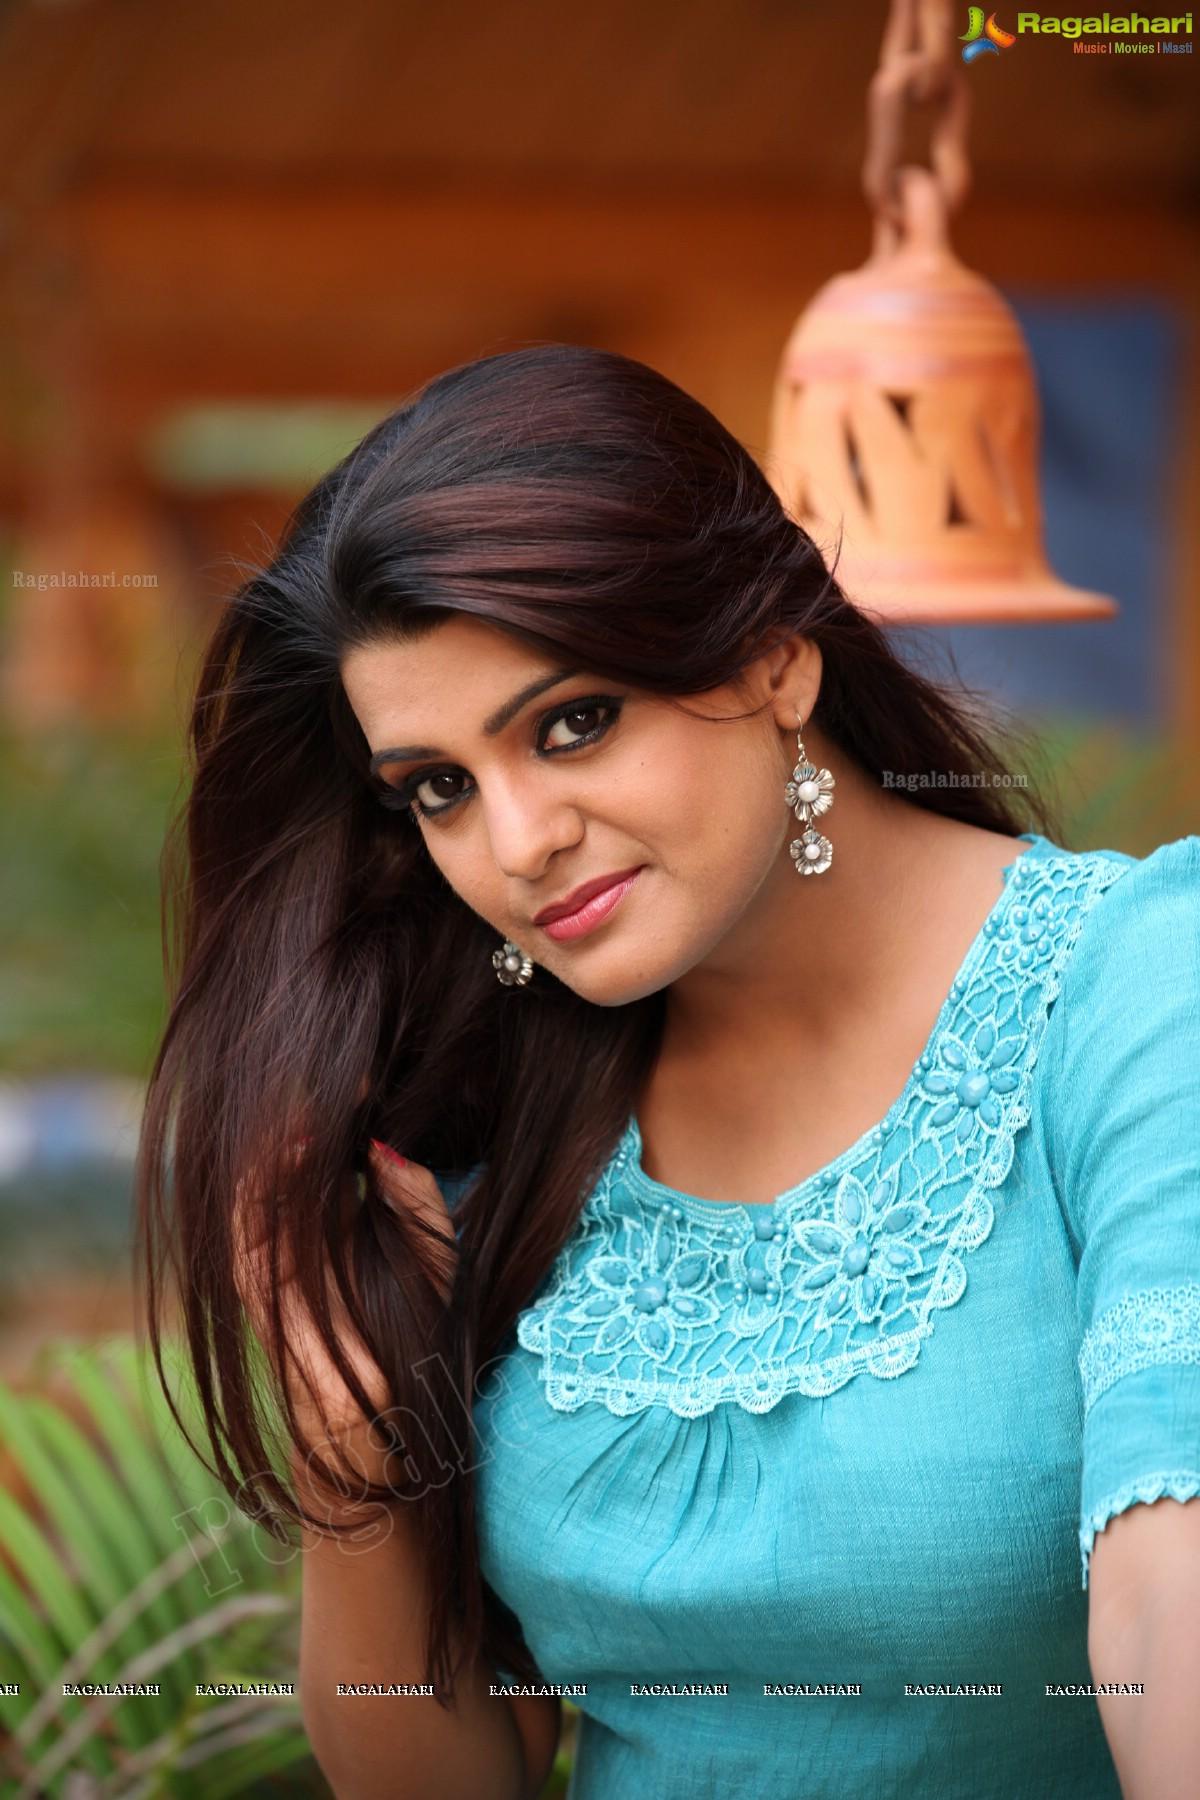 Tashu Kaushik (Exclusive)